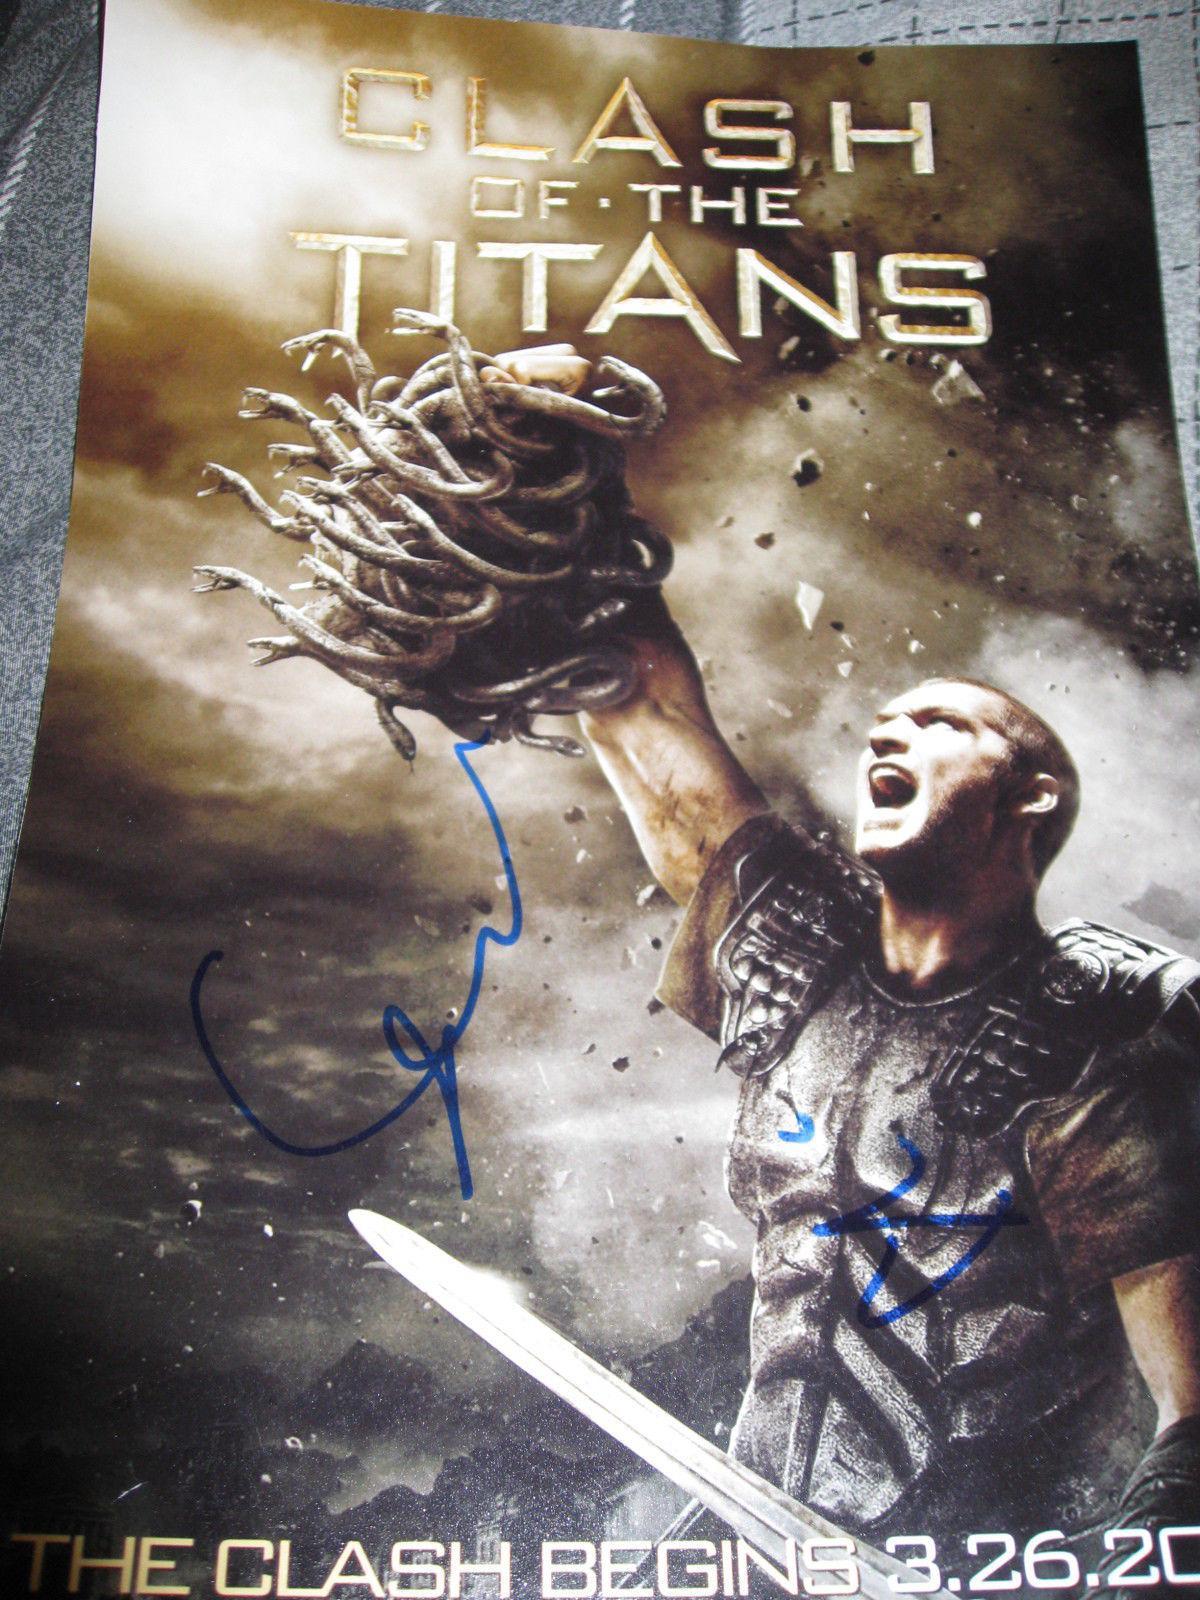 Sam Worthington Signed Autograph 11x14 Wrath Of The Titans In Person Coa Auto